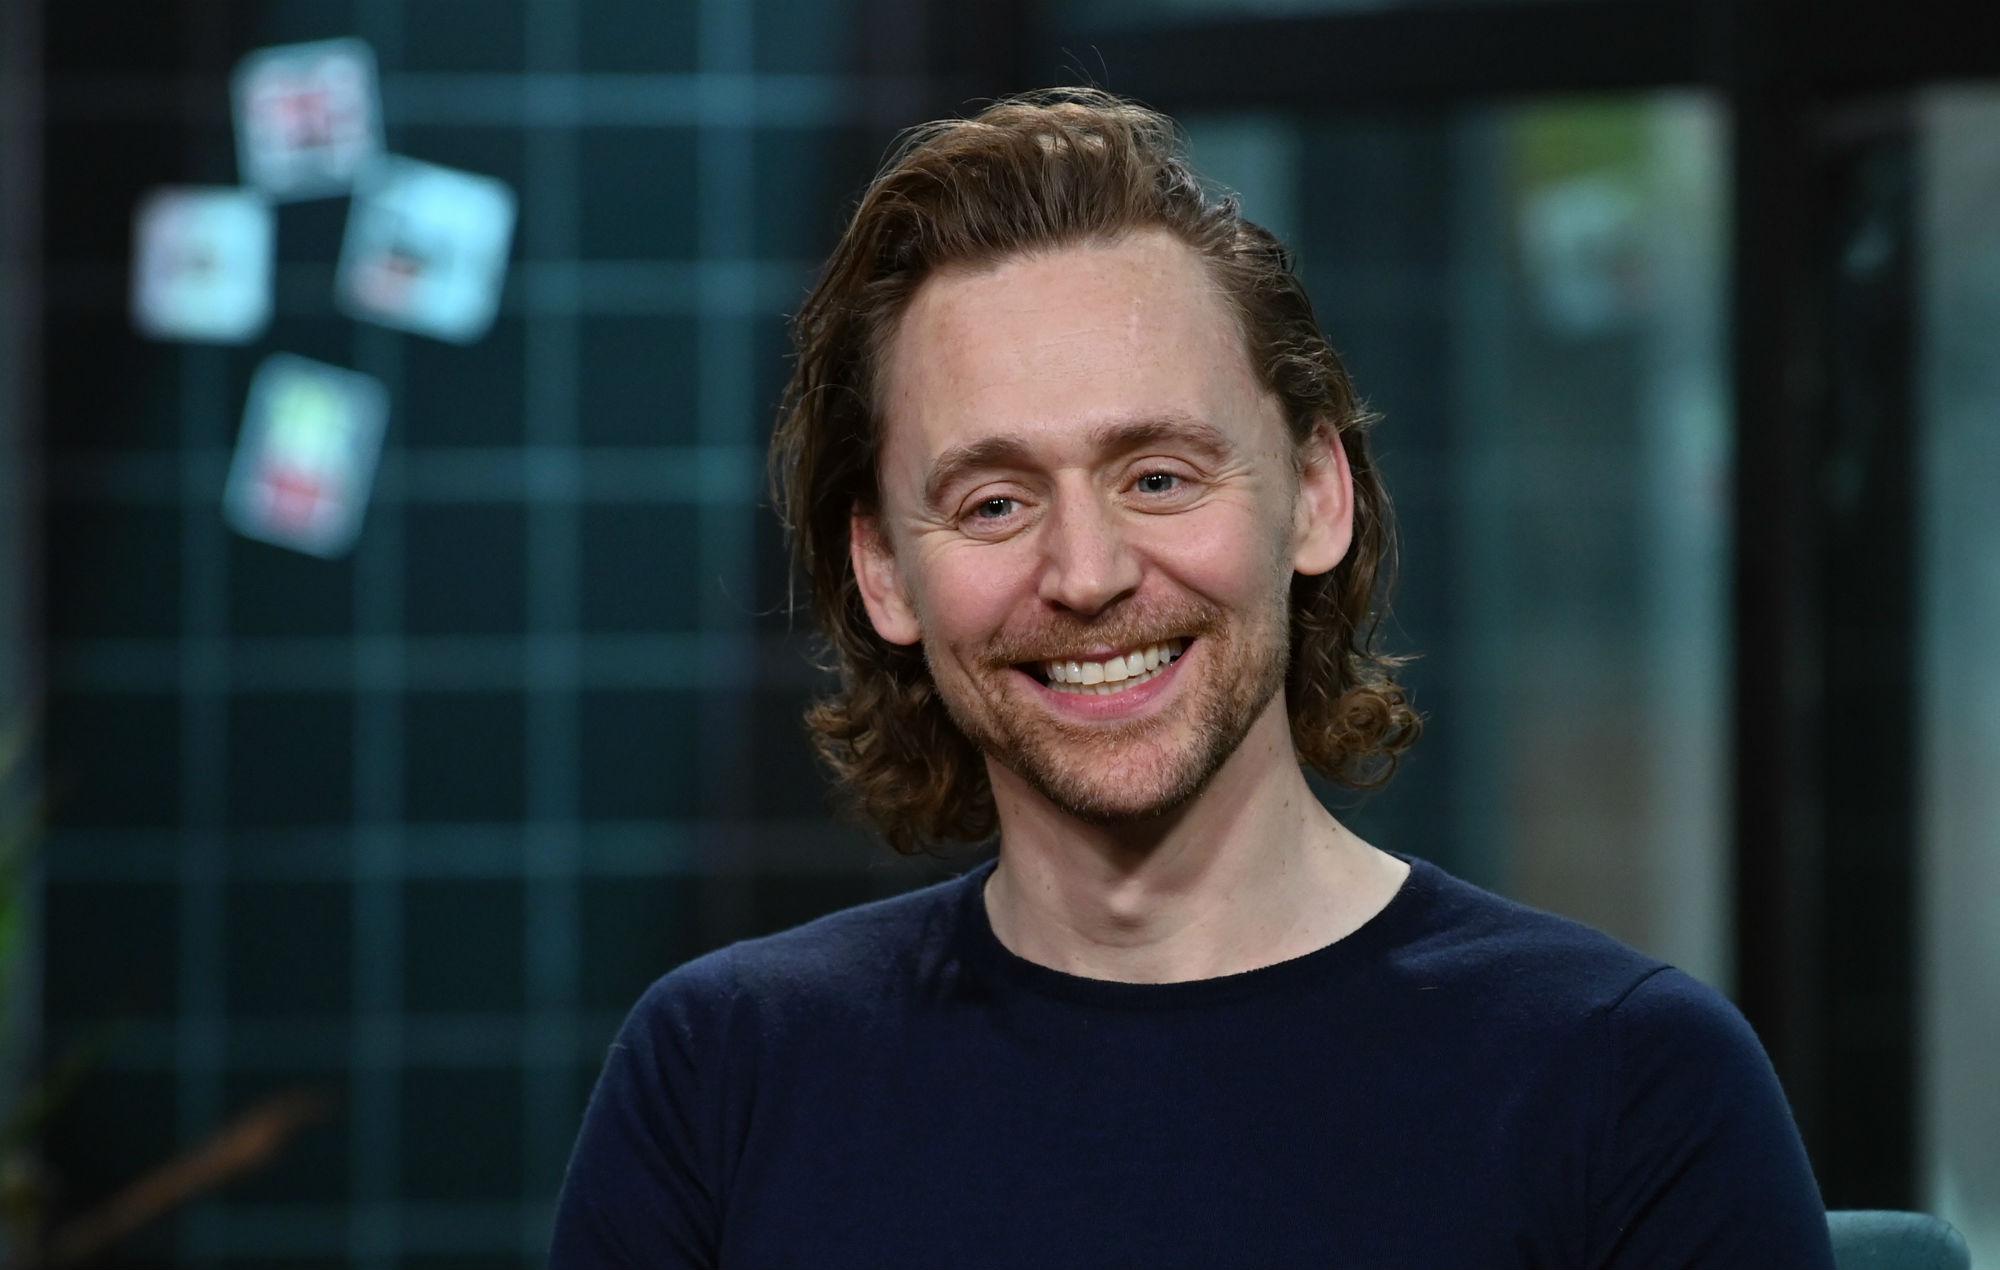 Tom Hiddleston to star in Loki